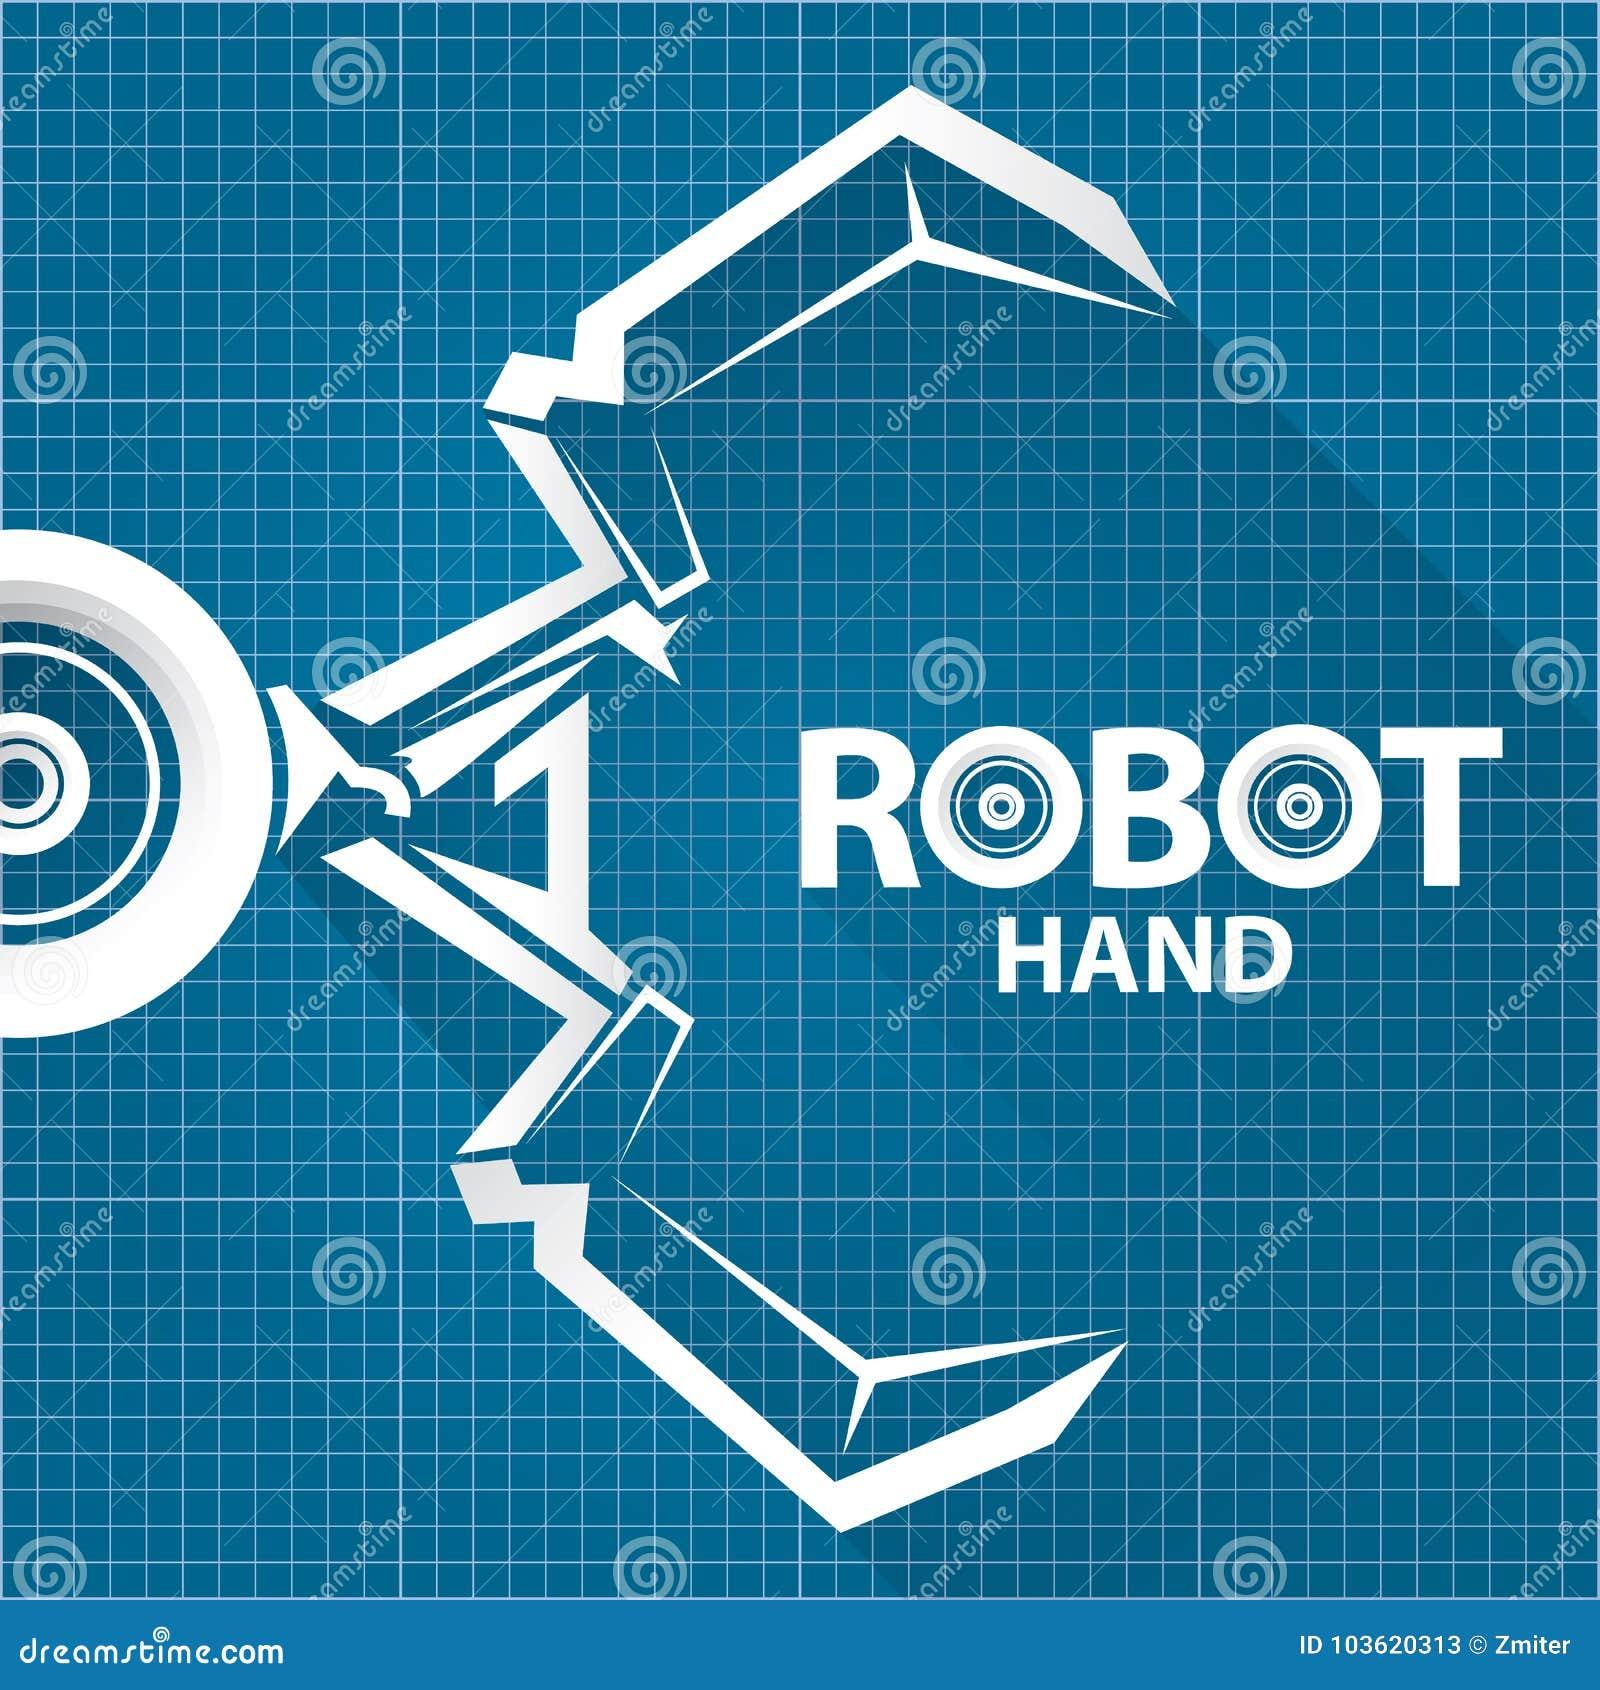 Vector robotic arm symbol on blueprint paper background robot vector robotic arm symbol on blueprint paper background robot hand technology background design malvernweather Image collections